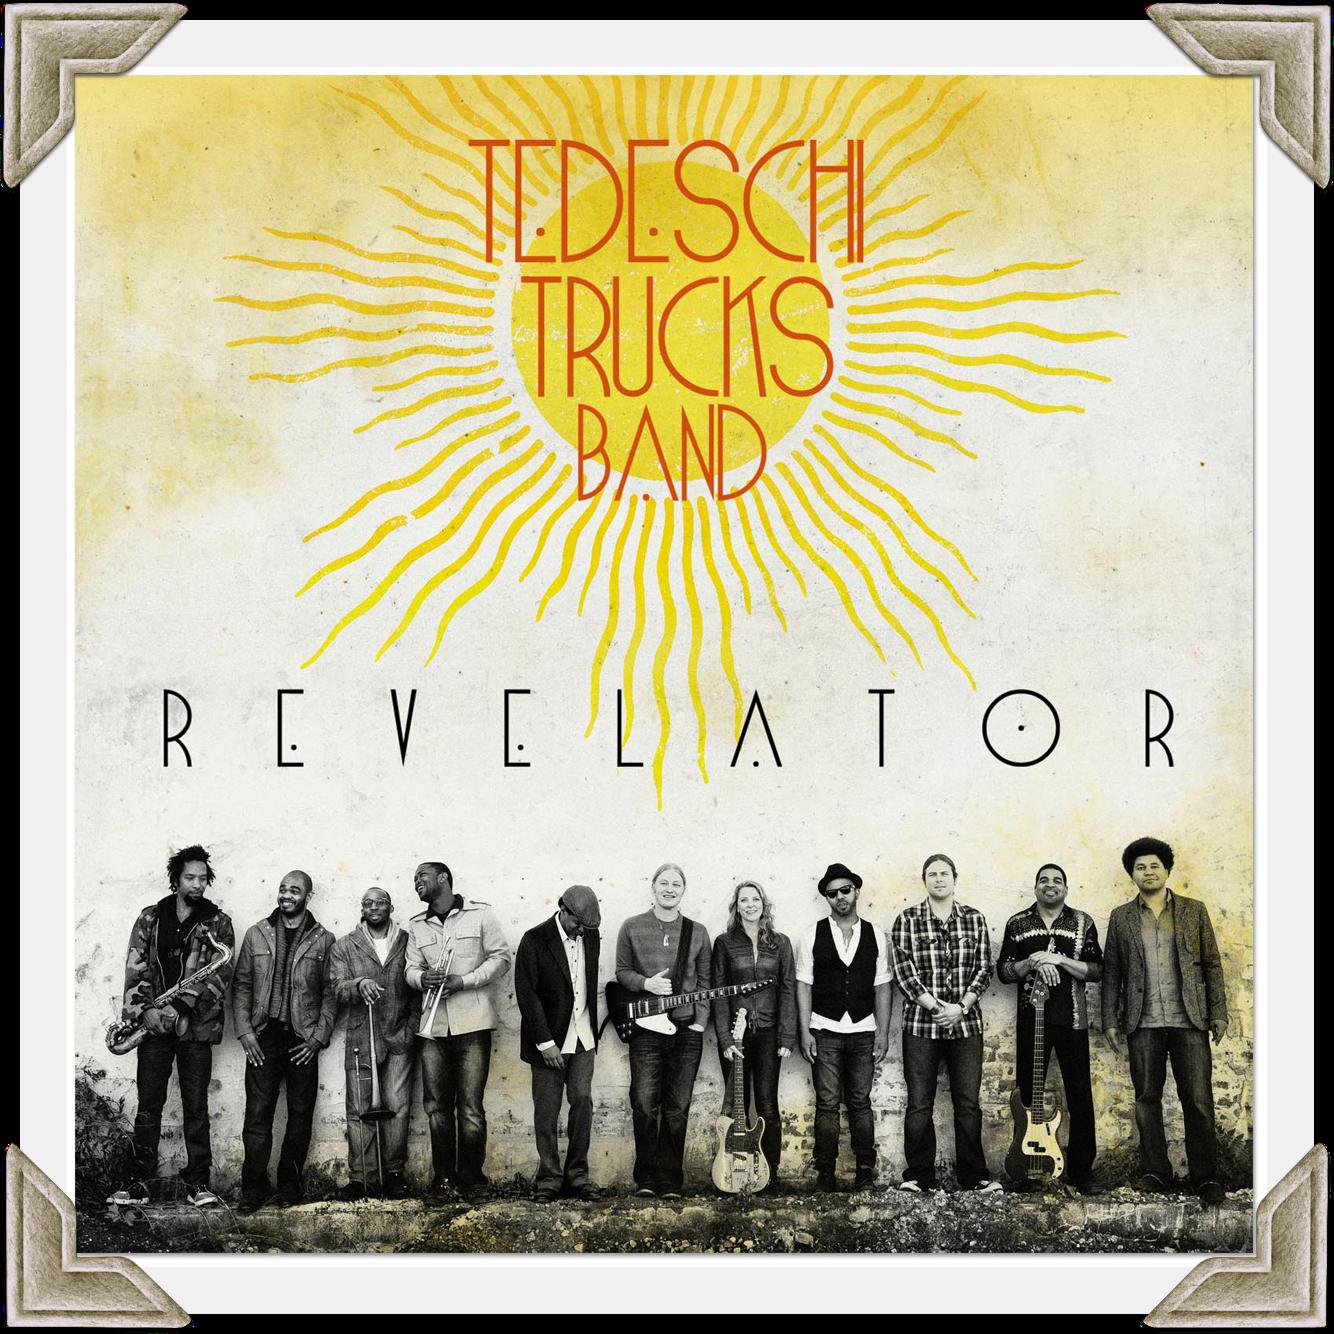 Tedeschi Trucks Band - Revelator (2011)_0.png